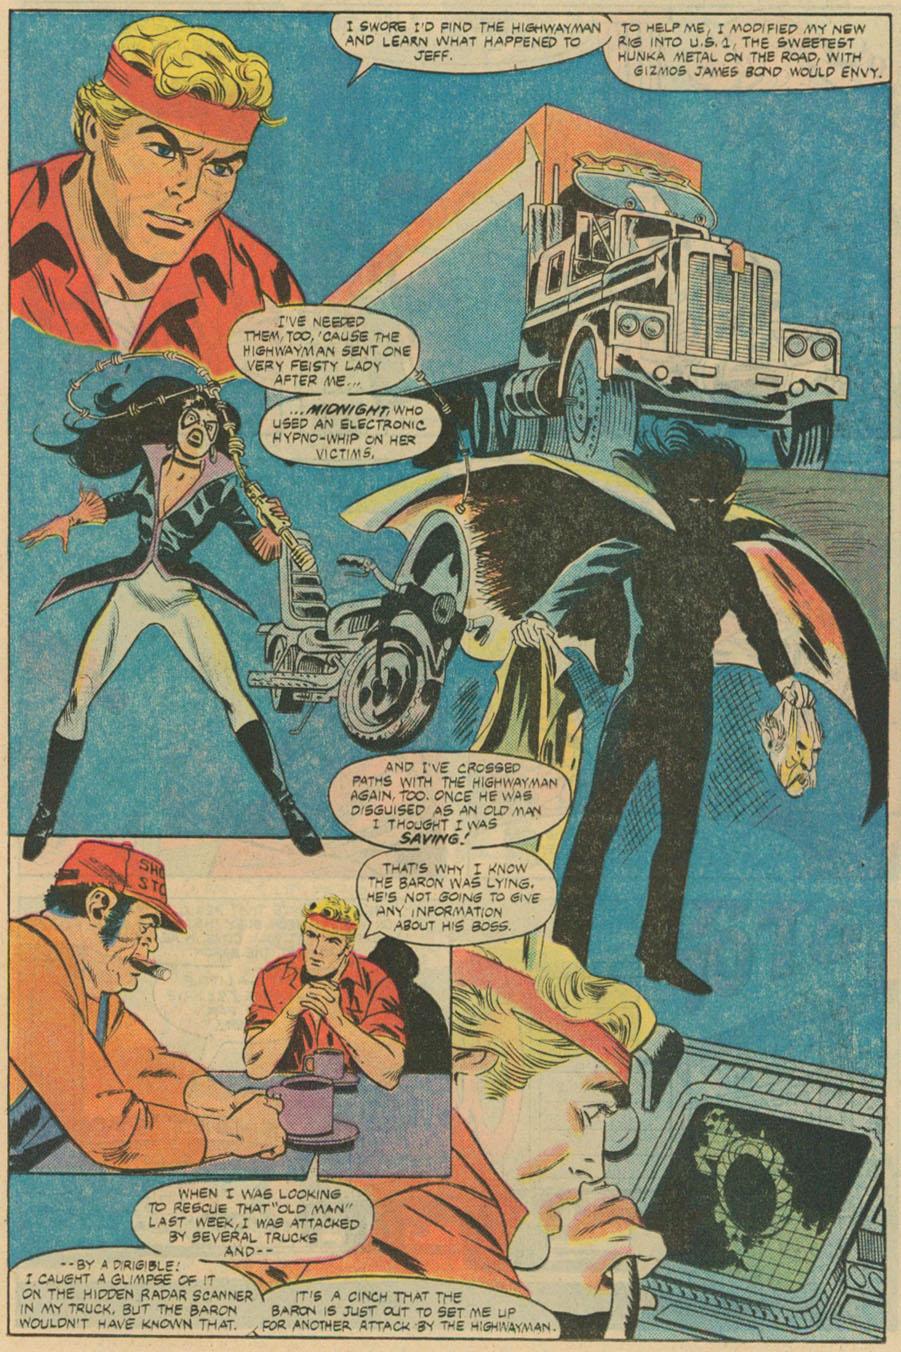 Read online U.S. 1 comic -  Issue #4 - 8